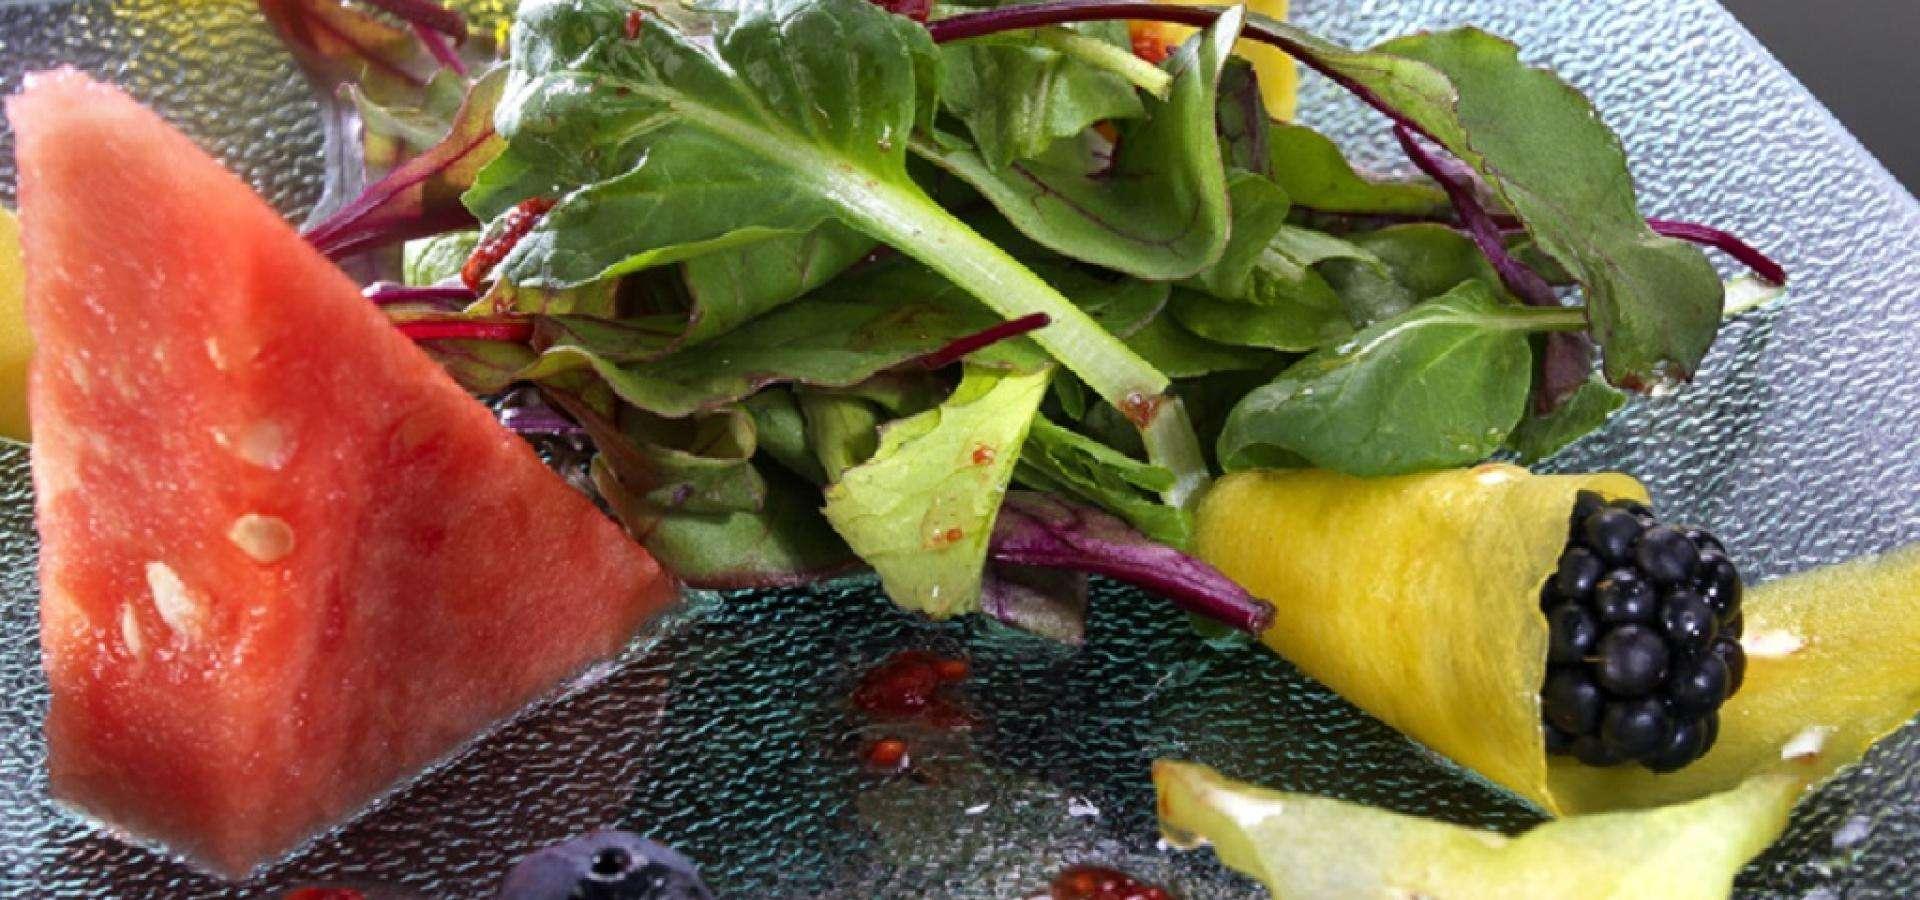 Detalle de ensalada de frutas de temporada